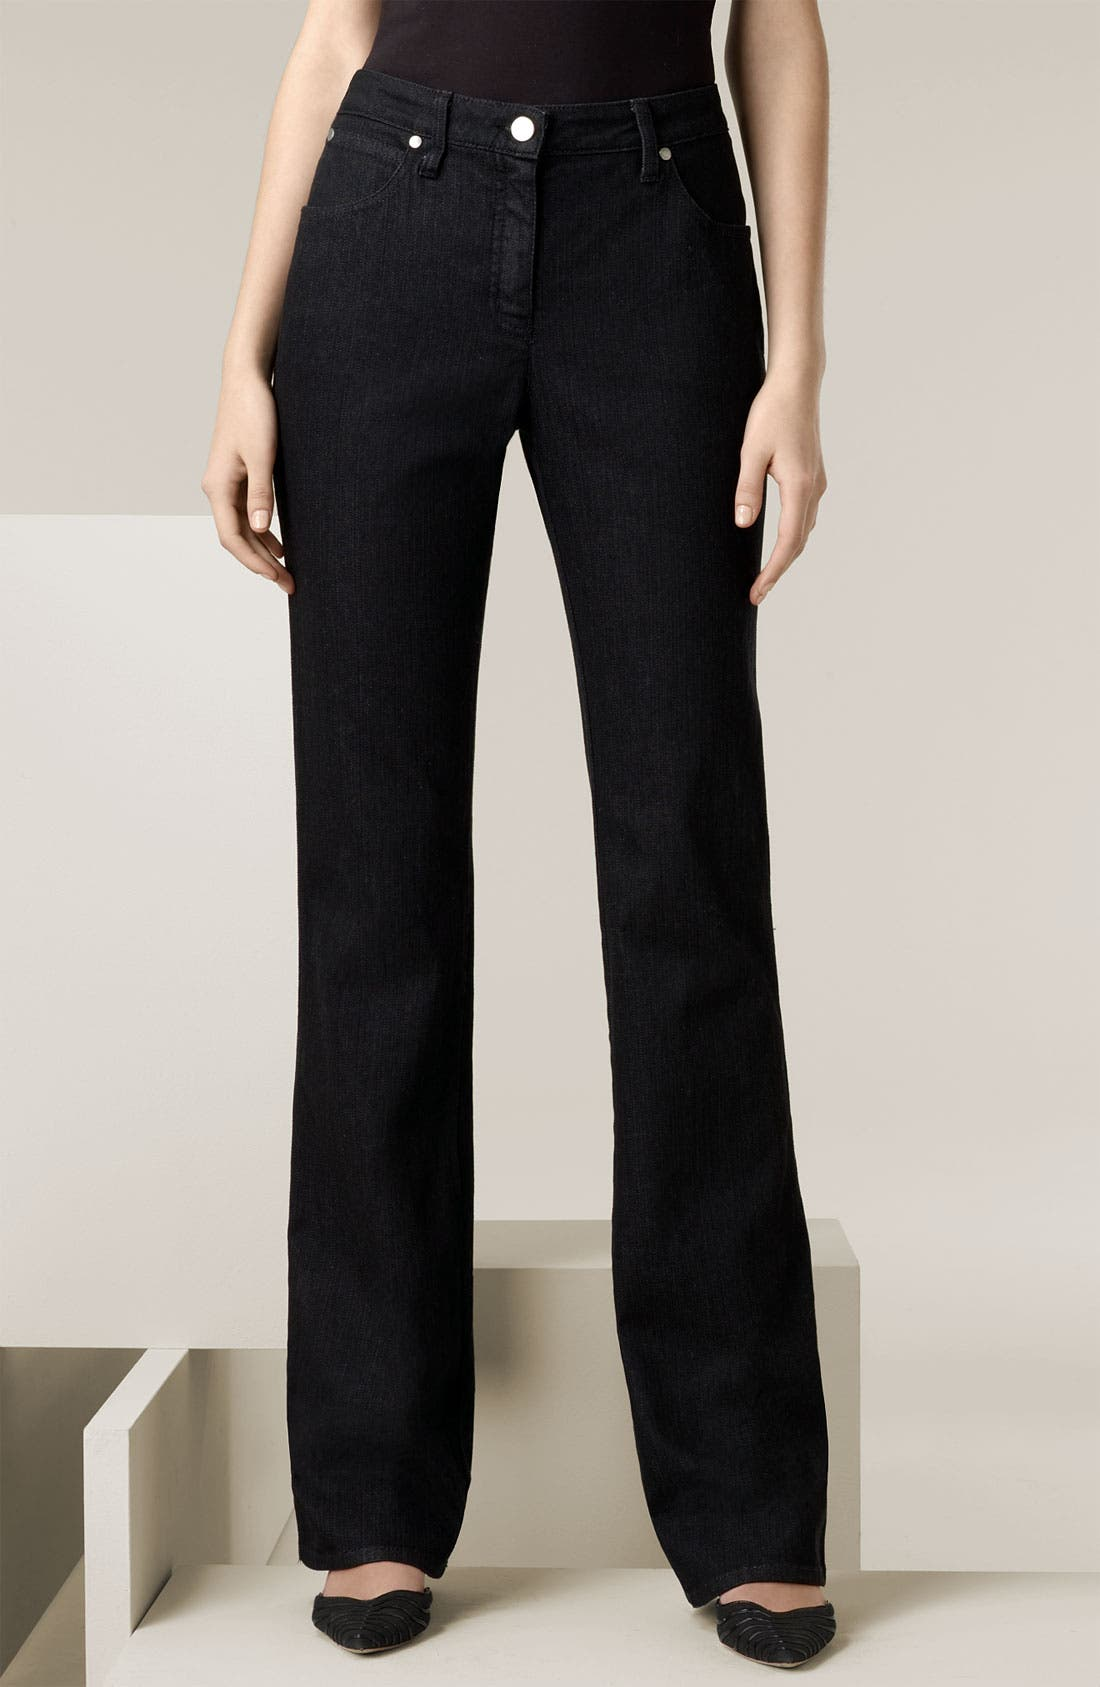 Alternate Image 1 Selected - Armani Collezioni Classic Stretch Denim Jeans